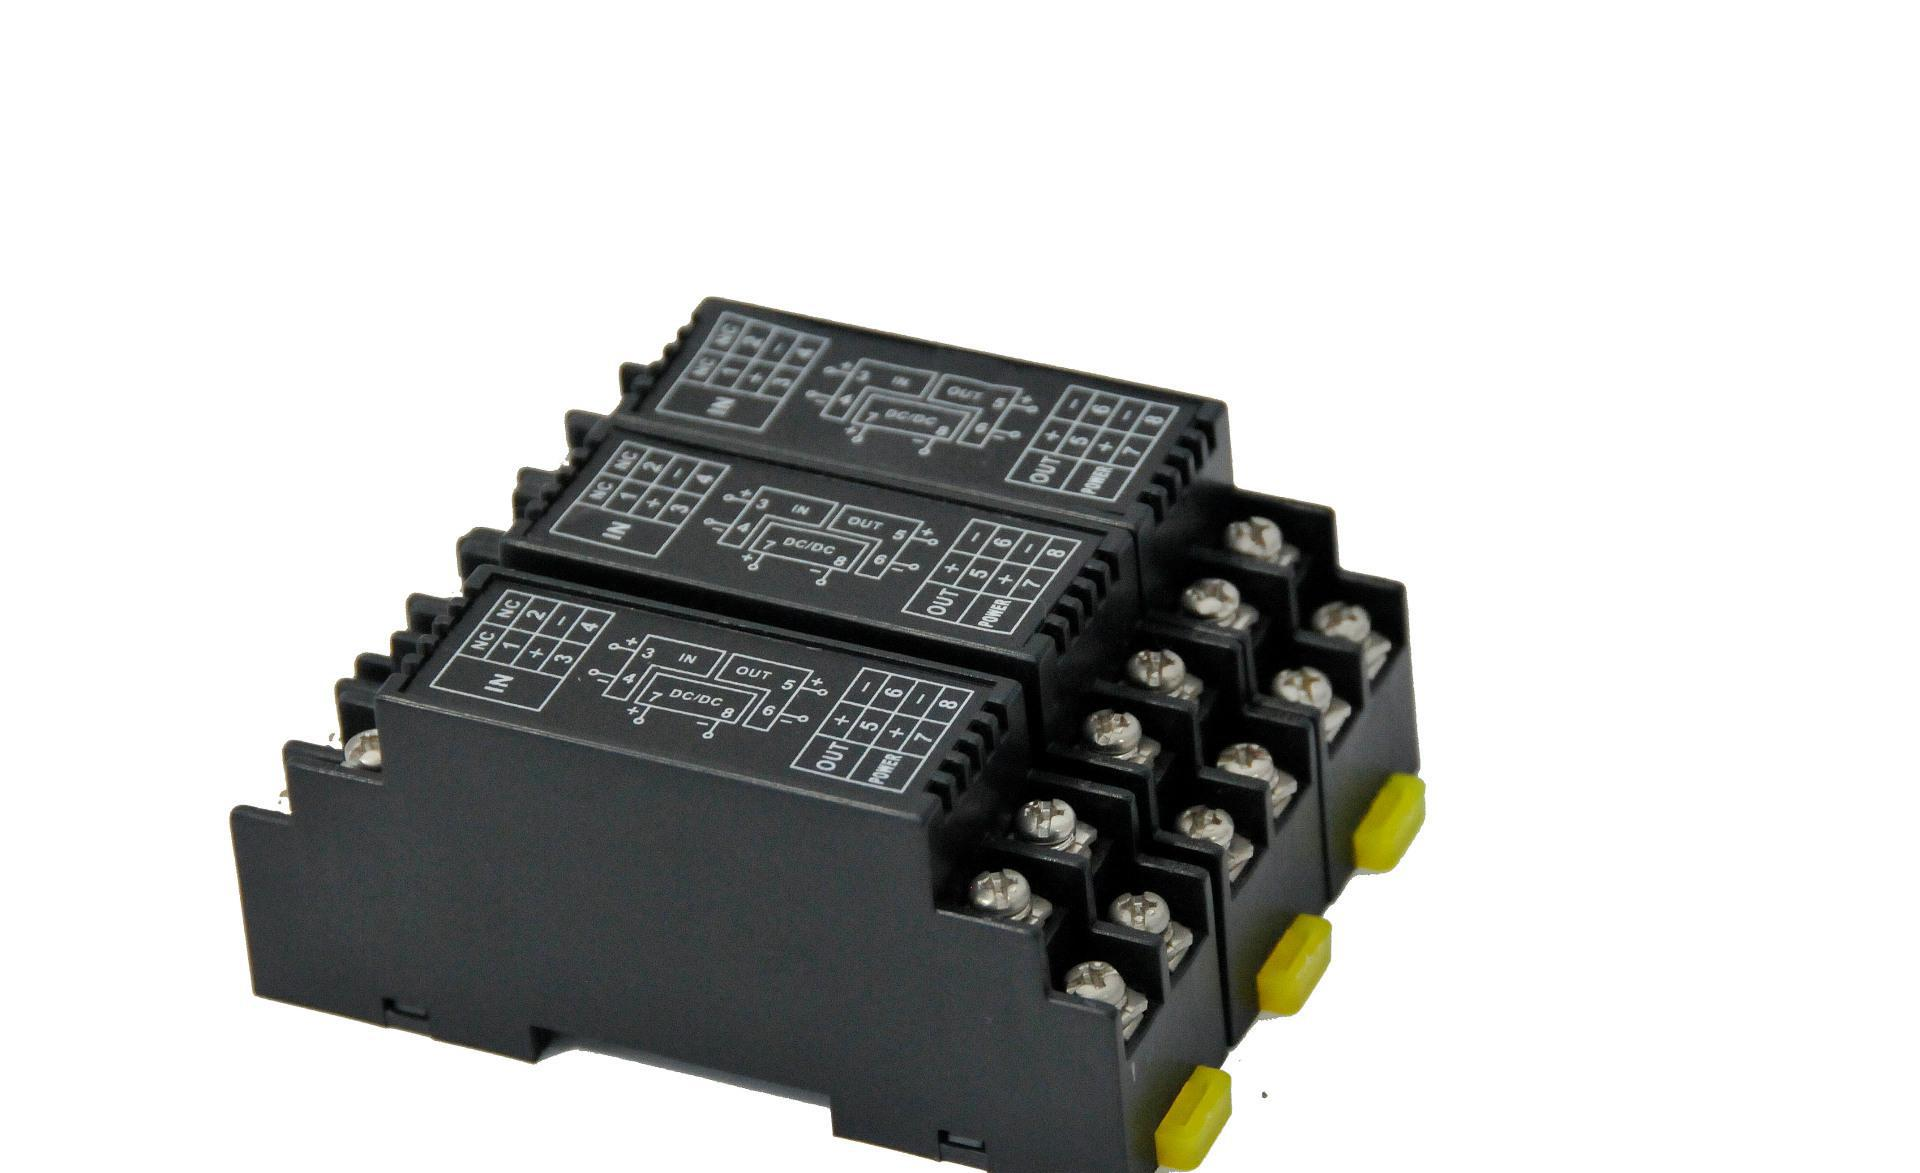 WS1522 DC Current Transmitter Signal Isolator 4-20mA Current Conversion Module 0-10V 0-5VWS1522 DC Current Transmitter Signal Isolator 4-20mA Current Conversion Module 0-10V 0-5V